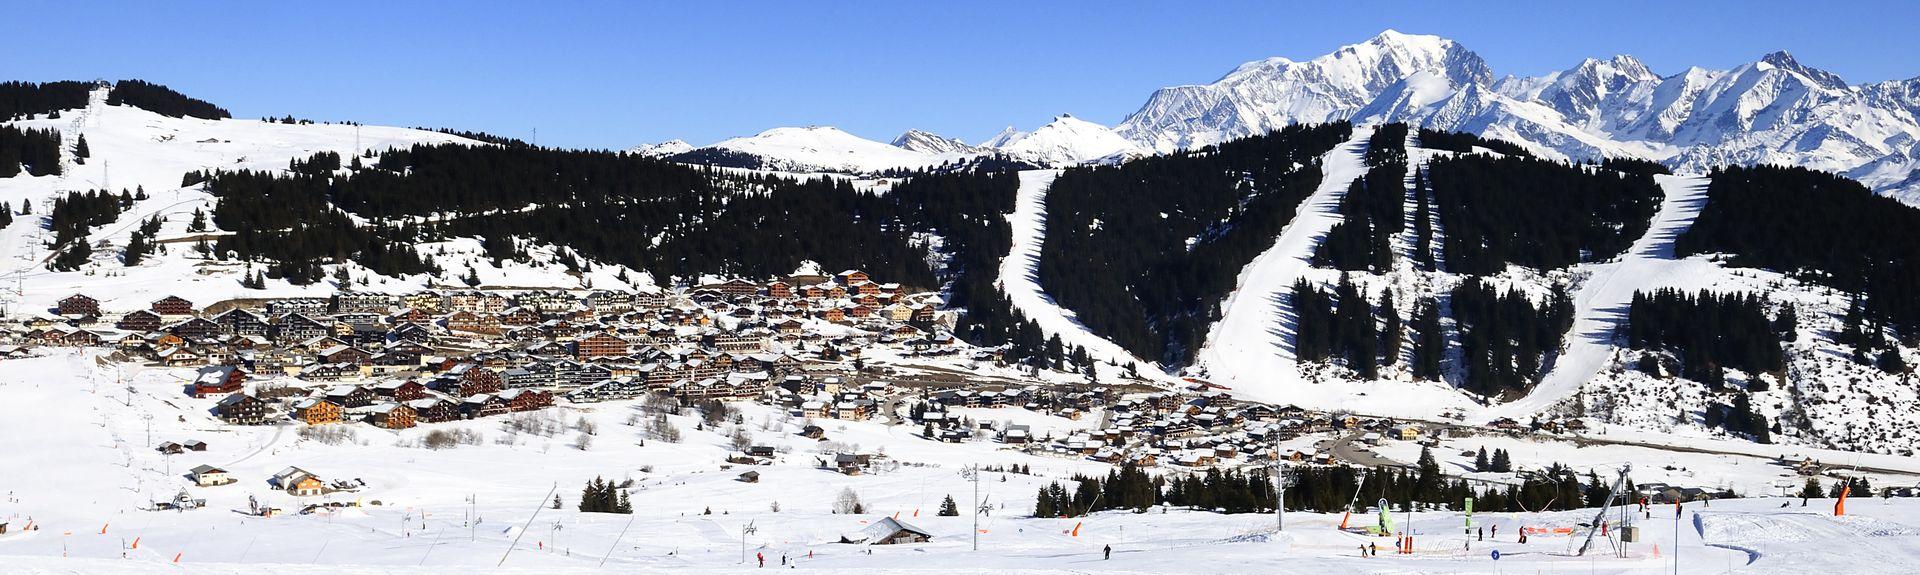 Les Saisies, Hauteluce, Auvergne-Rhône-Alpes, Ranska